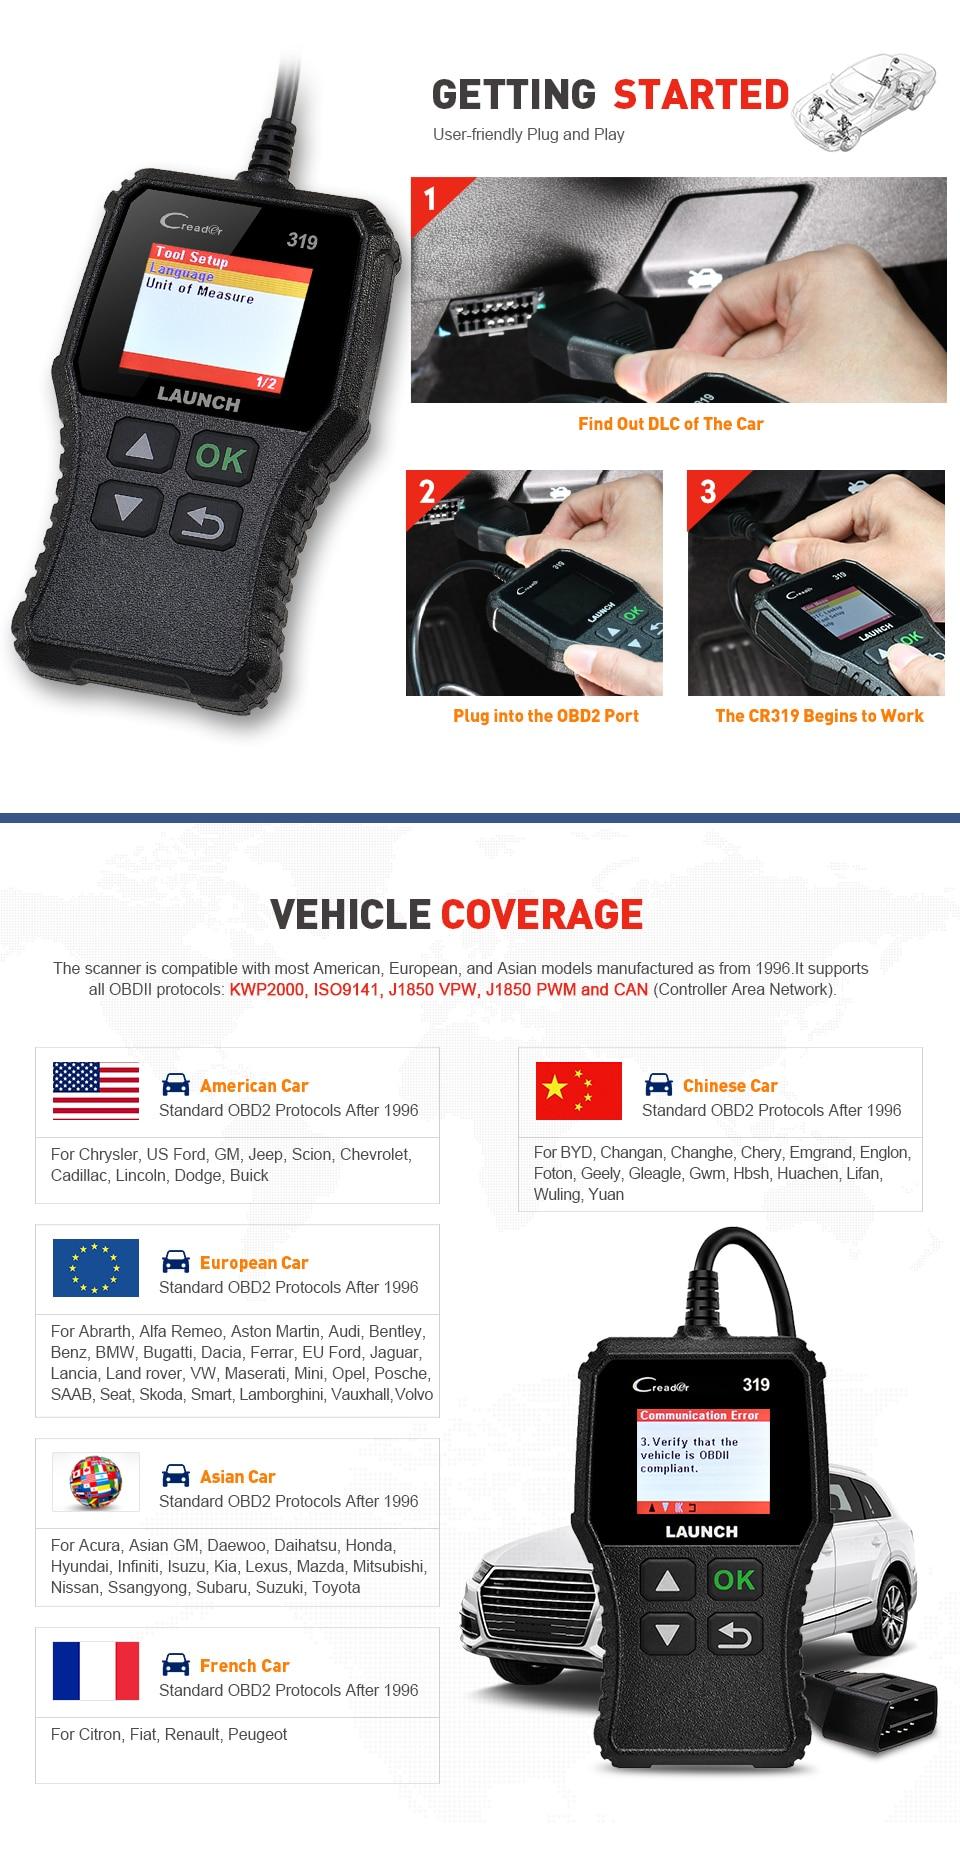 HTB1JDChaZvrK1Rjy0Feq6ATmVXaN Launch X431 Creader 319 CR319 Auto Code Reader Full OBDII EOBD Automotive Diagnostic Tool OBD2 Scanner as Creader 6001 CR3001